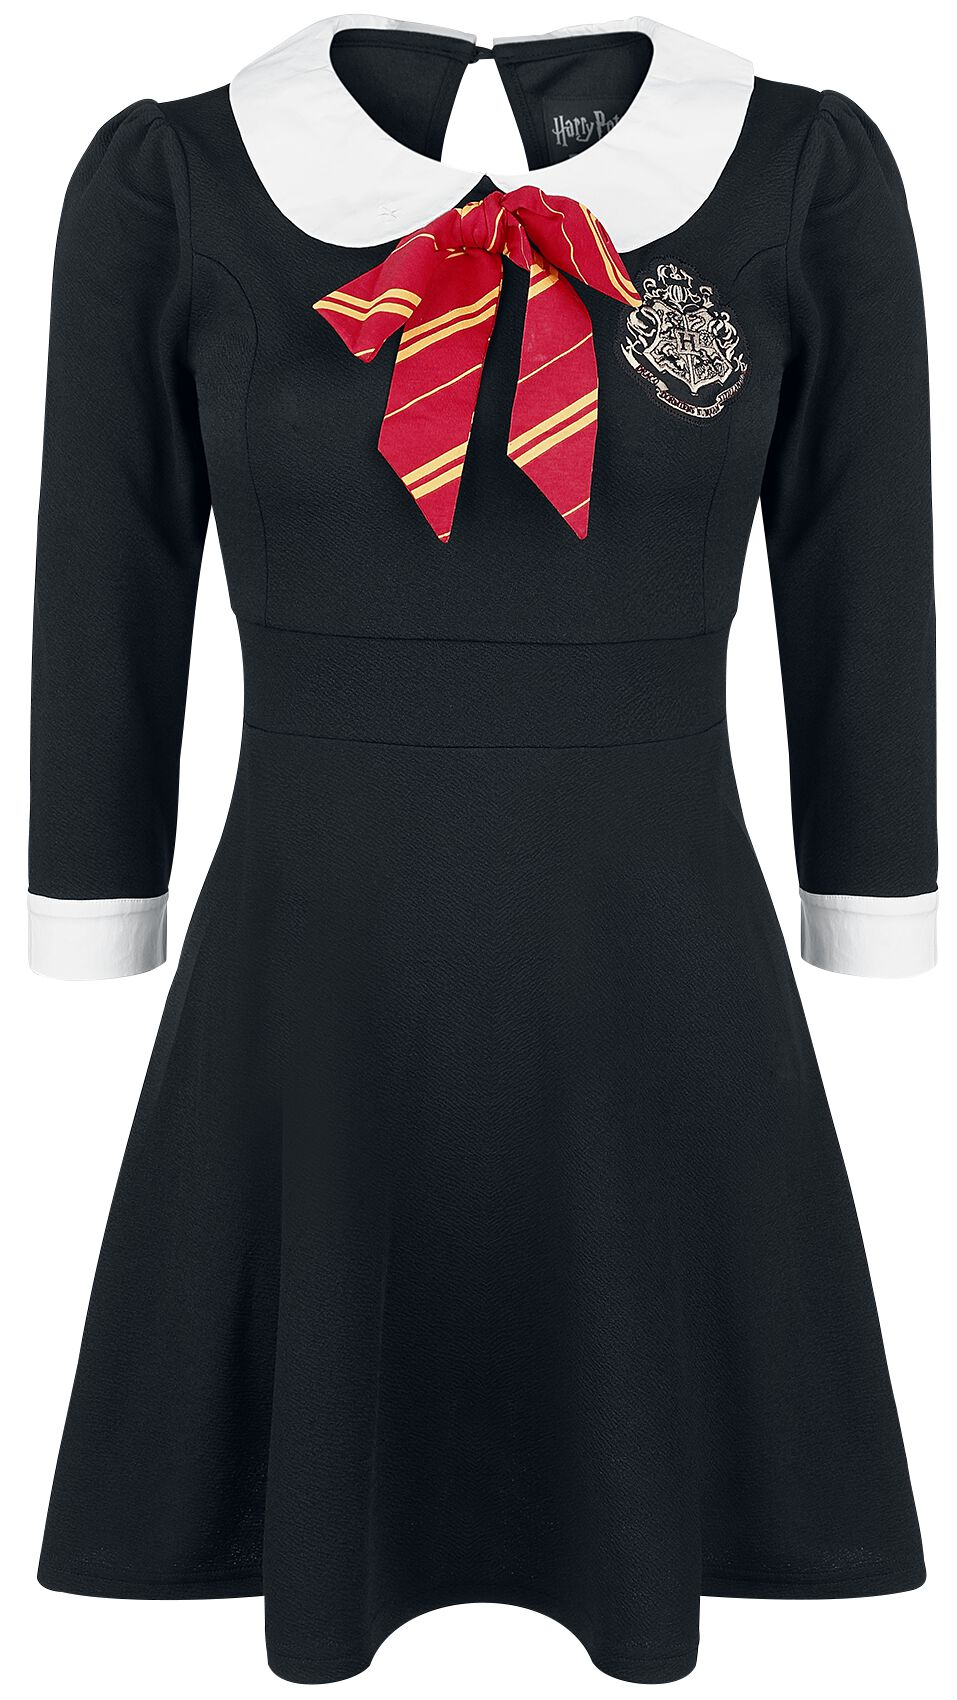 Harry Potter Hauskleid Sukienka czarny